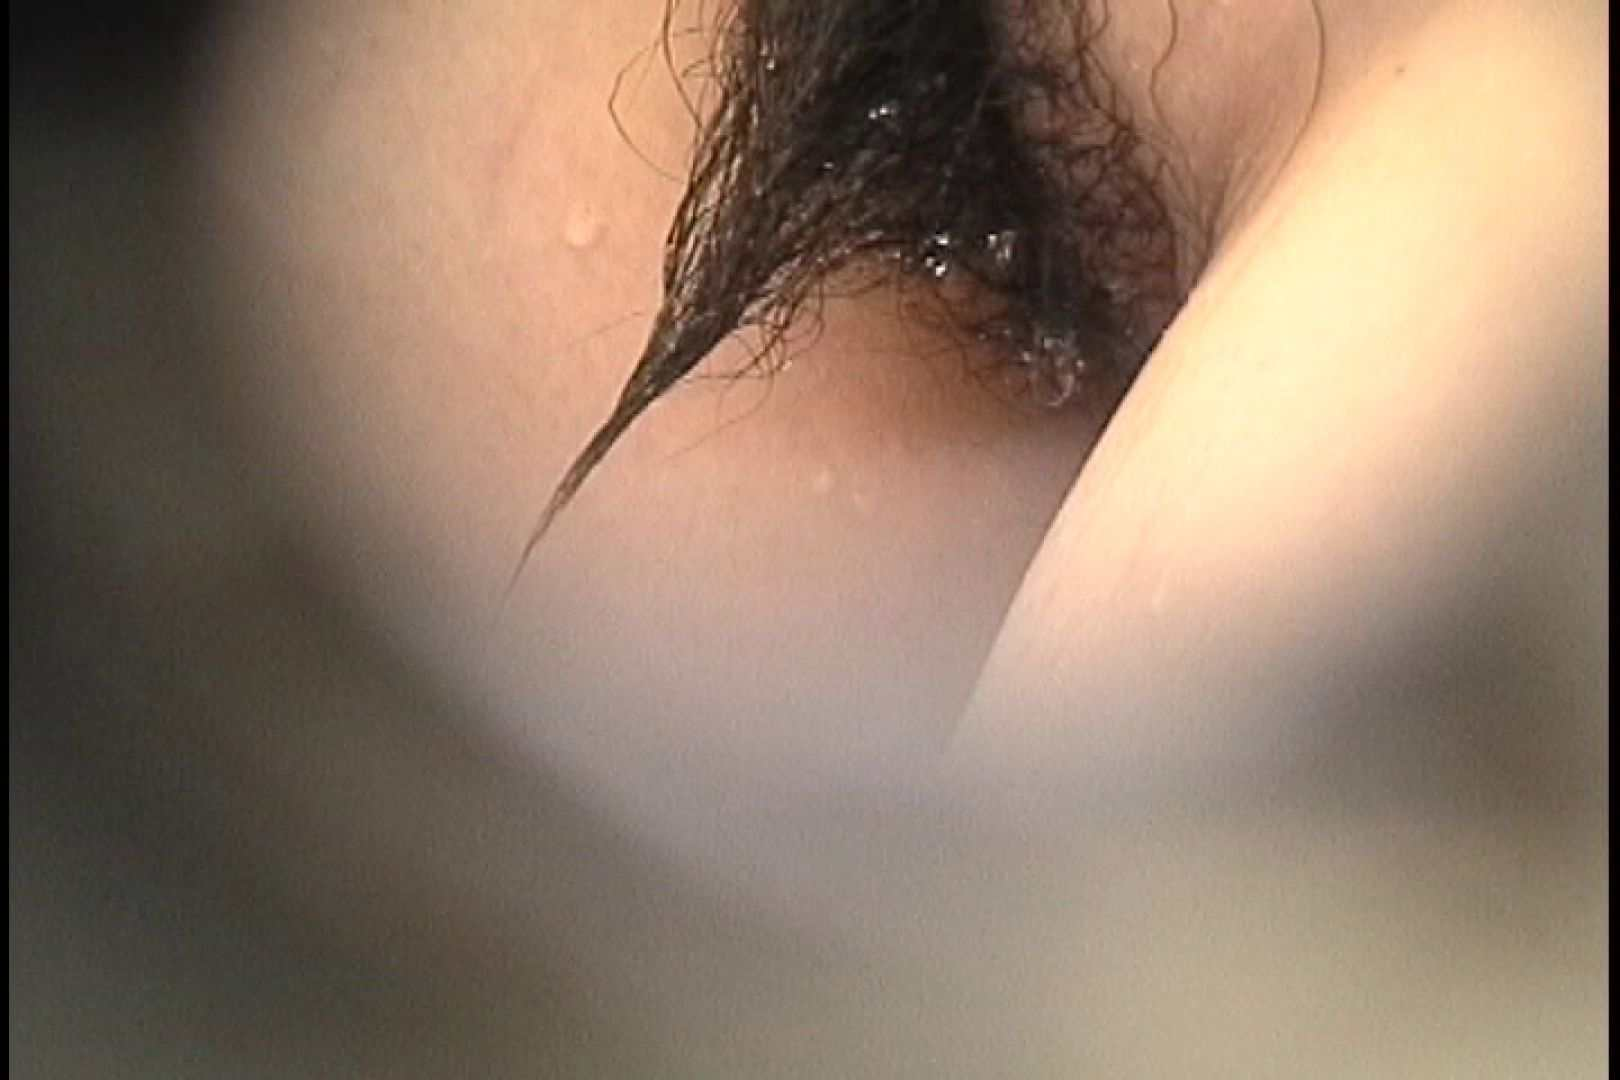 No.107 さすがの画質!濃い陰毛に阻まれ道が見えません 接写 | 桃色シャワー  90pic 46